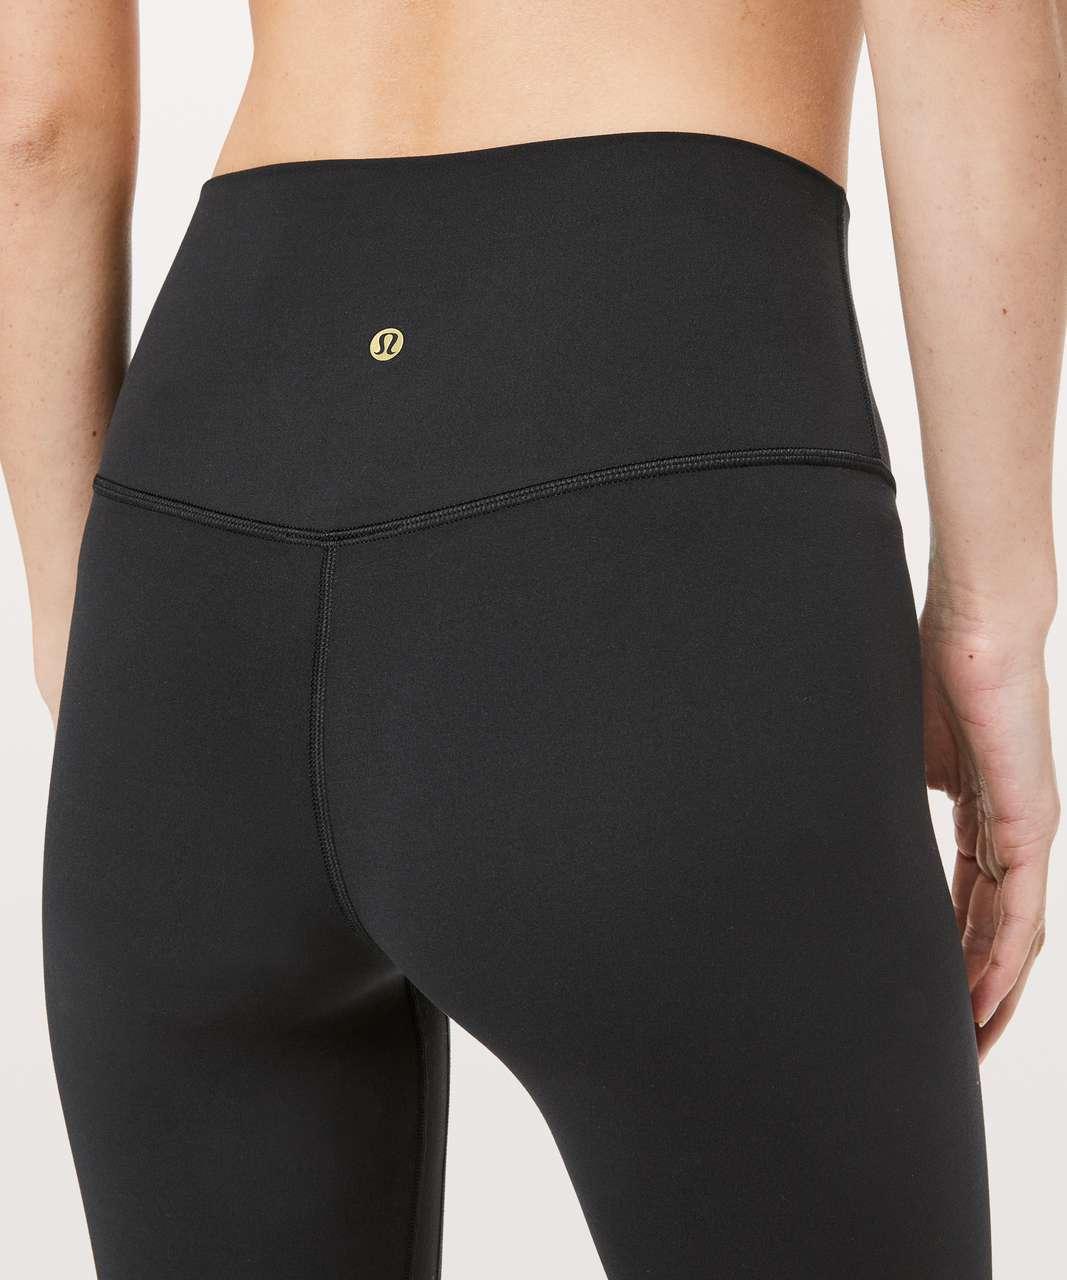 Lululemon Align Pant II *Lunar New Year - Black